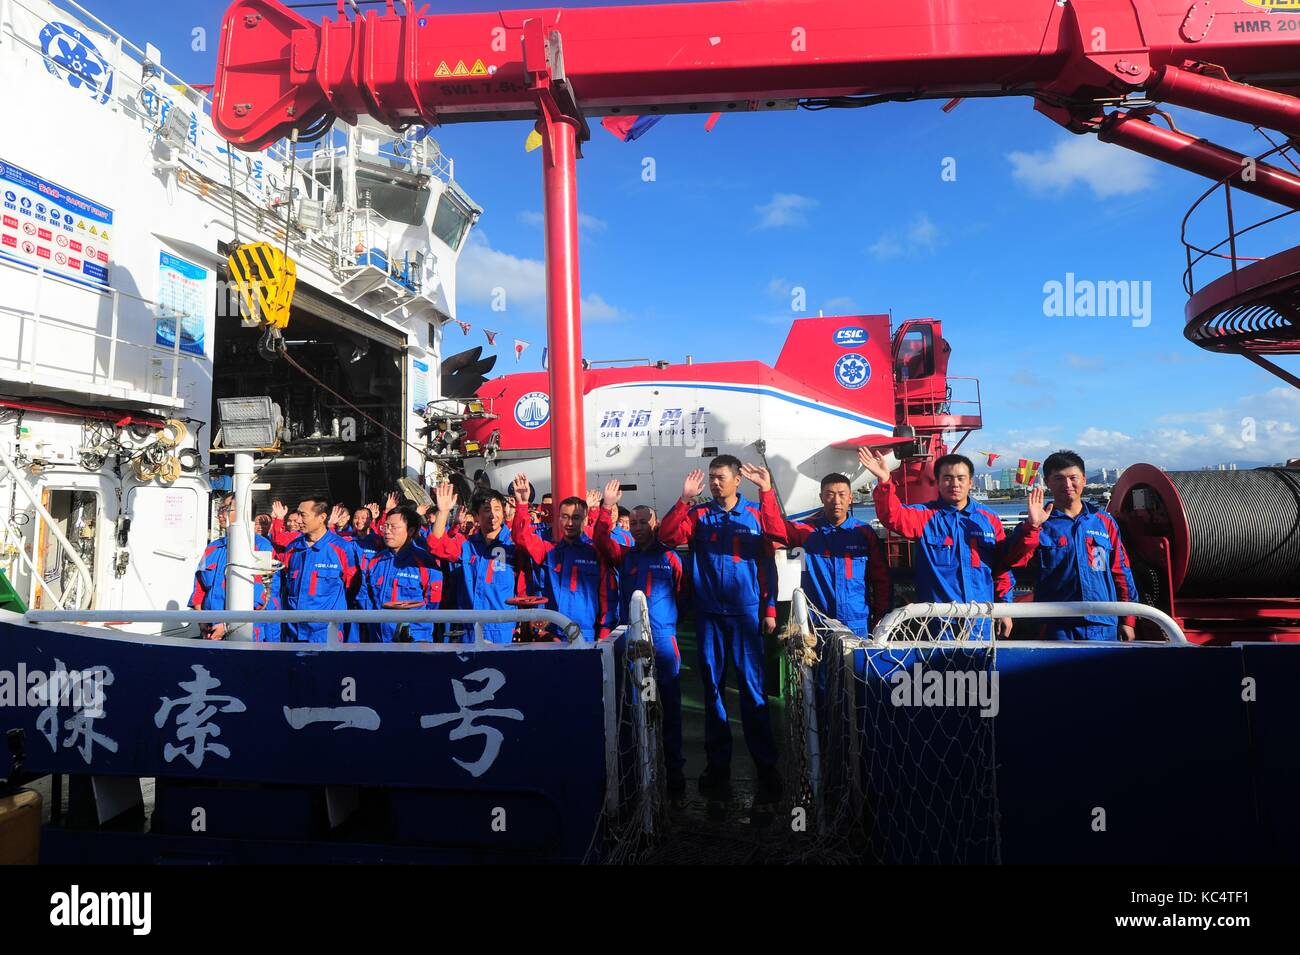 Sanya, China's Hainan Province. 3rd Oct, 2017. The manned submersible named Shenhai Yongshi, or deepsea warrior, - Stock Image